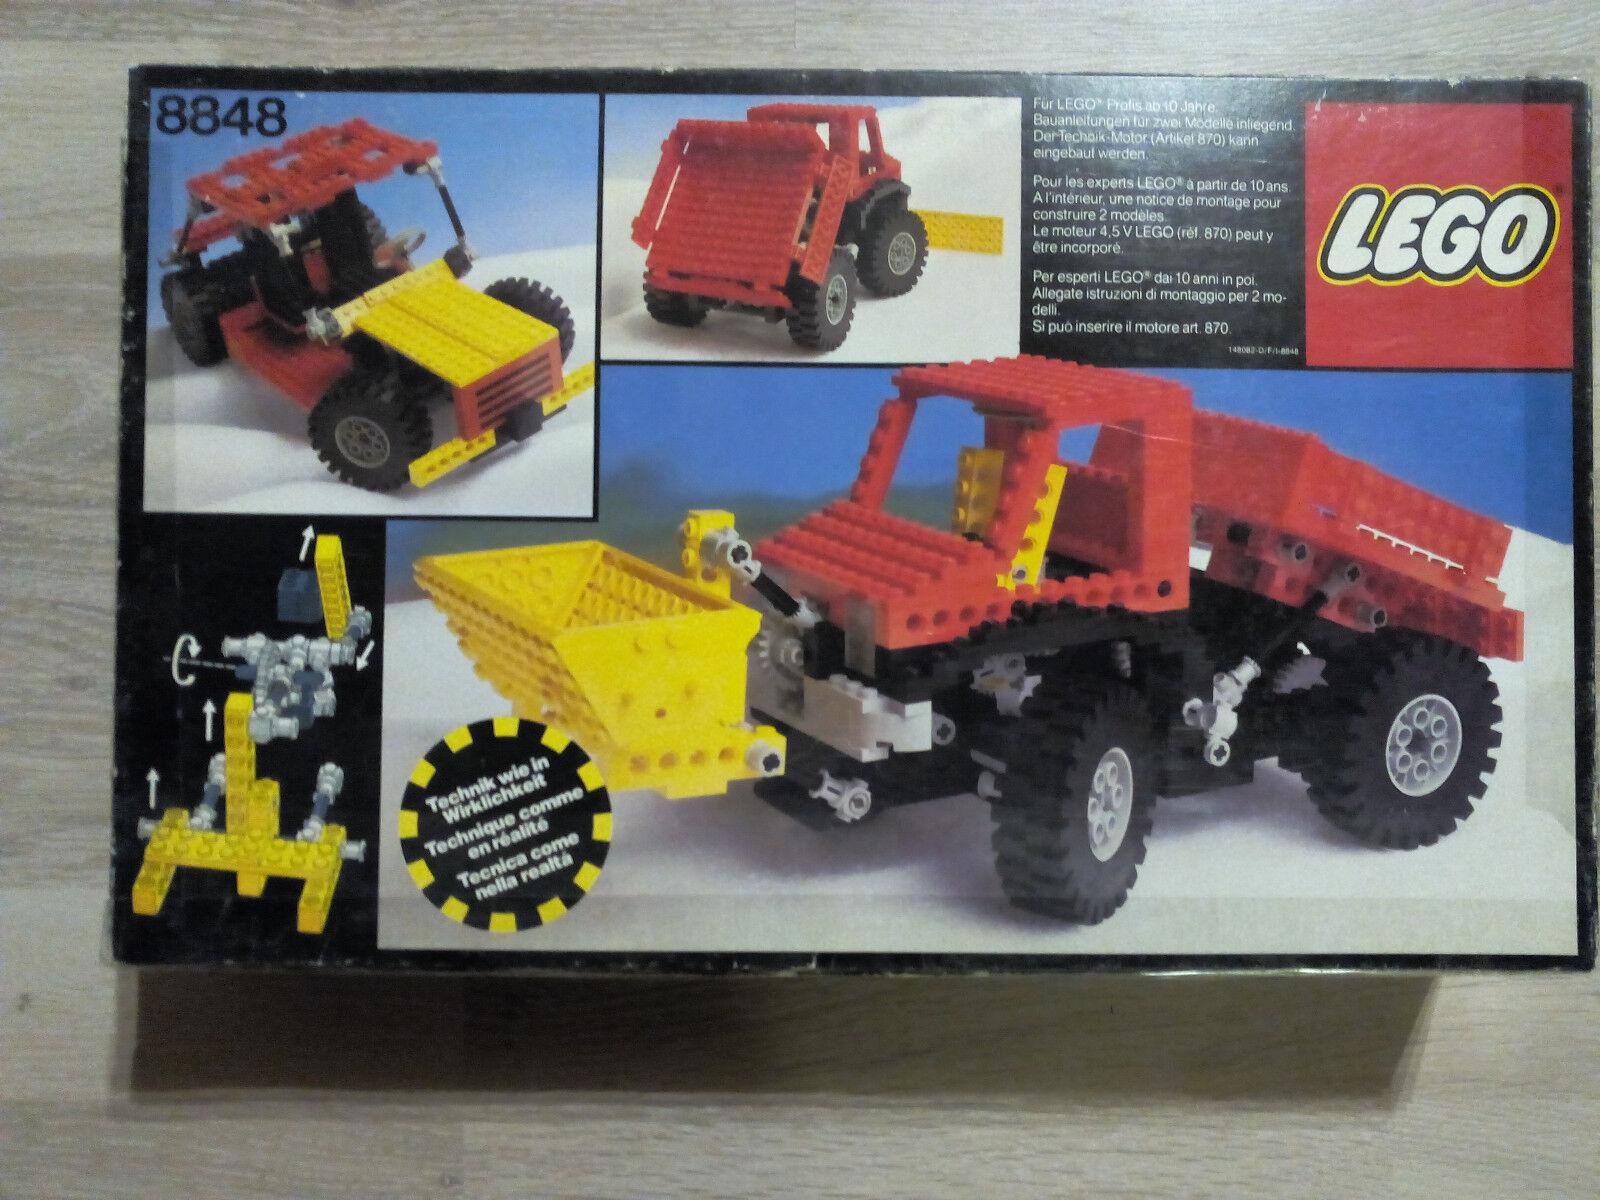 Lego Technic Technik 8848 Power Truck   GUTER ZUSTAND - RARITÄT